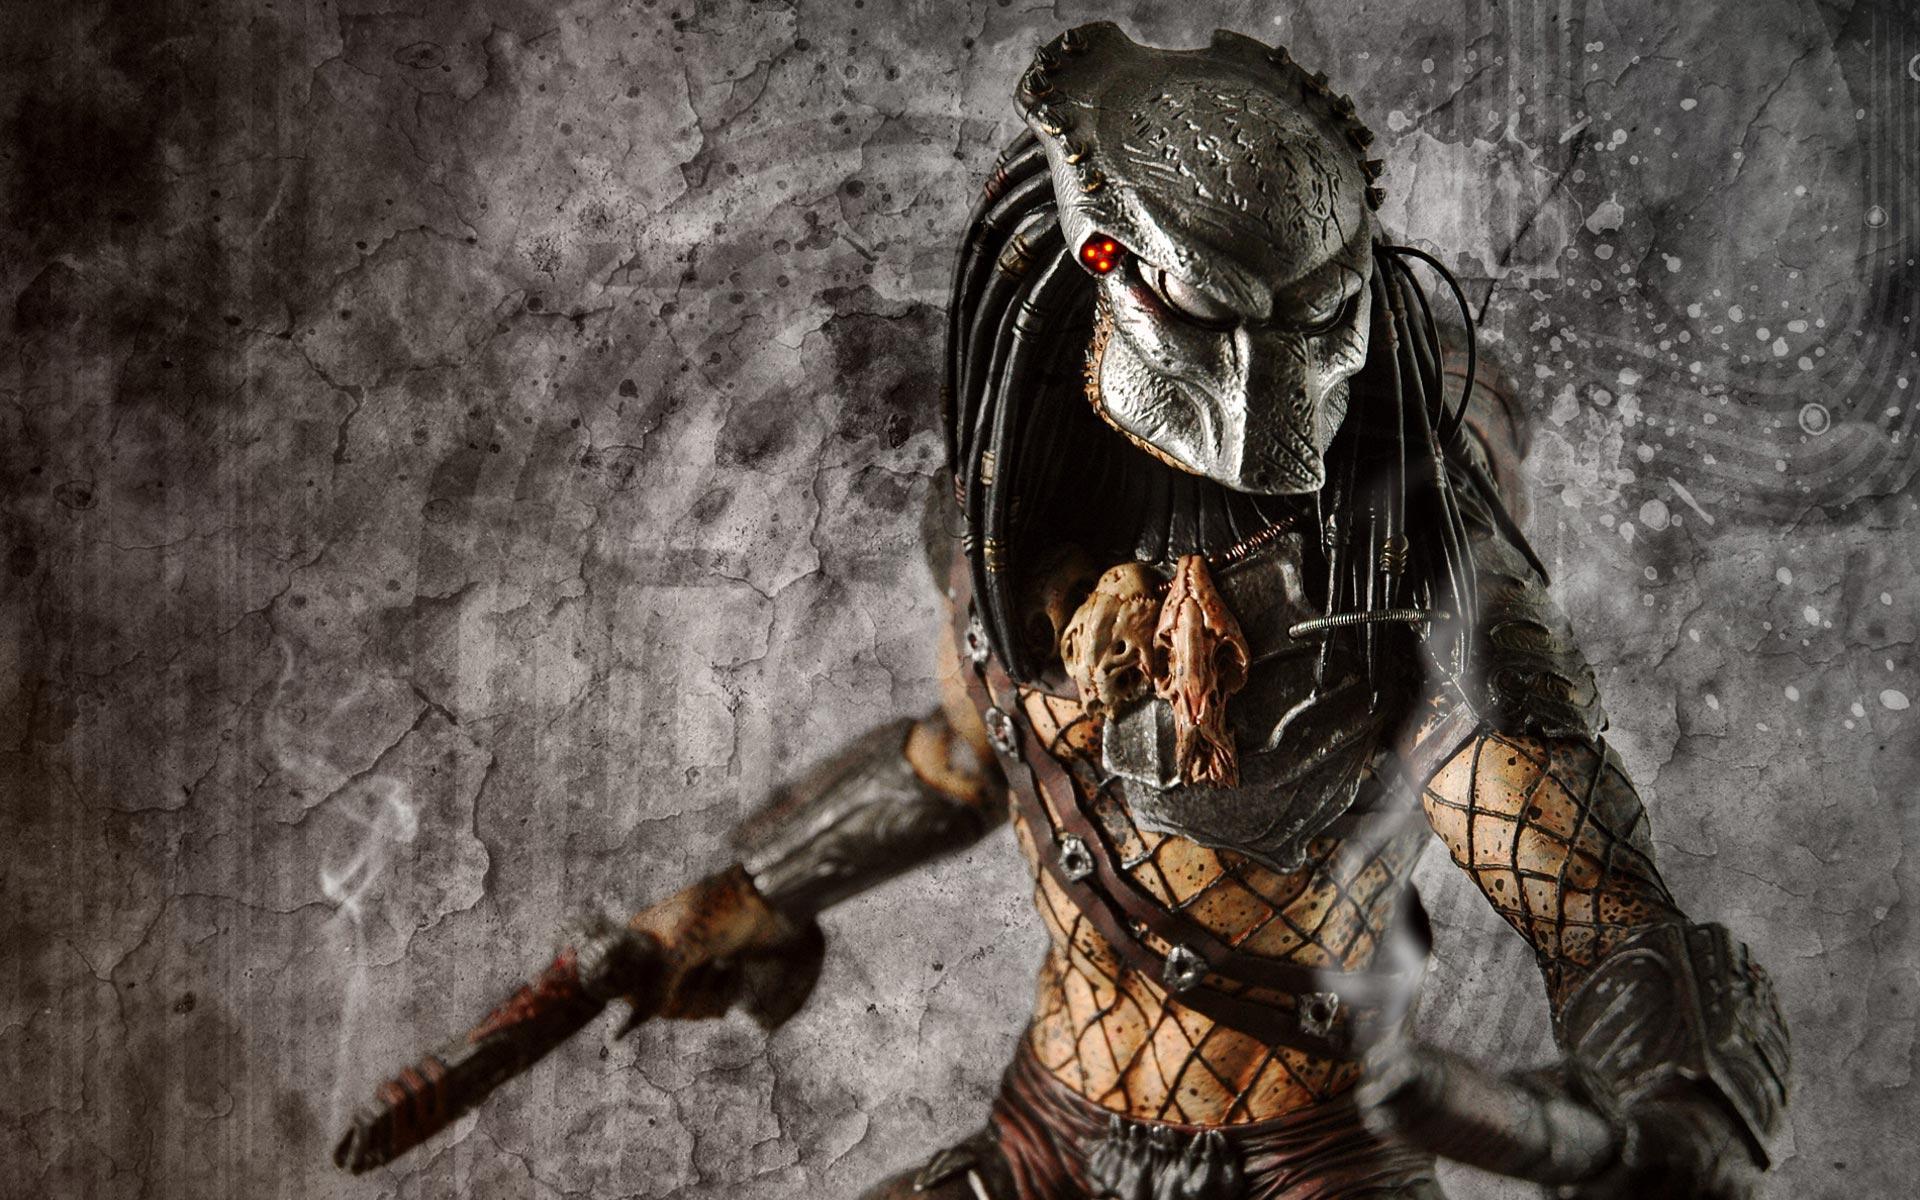 Predator Wallpapers - Top Free Predator Backgrounds ...